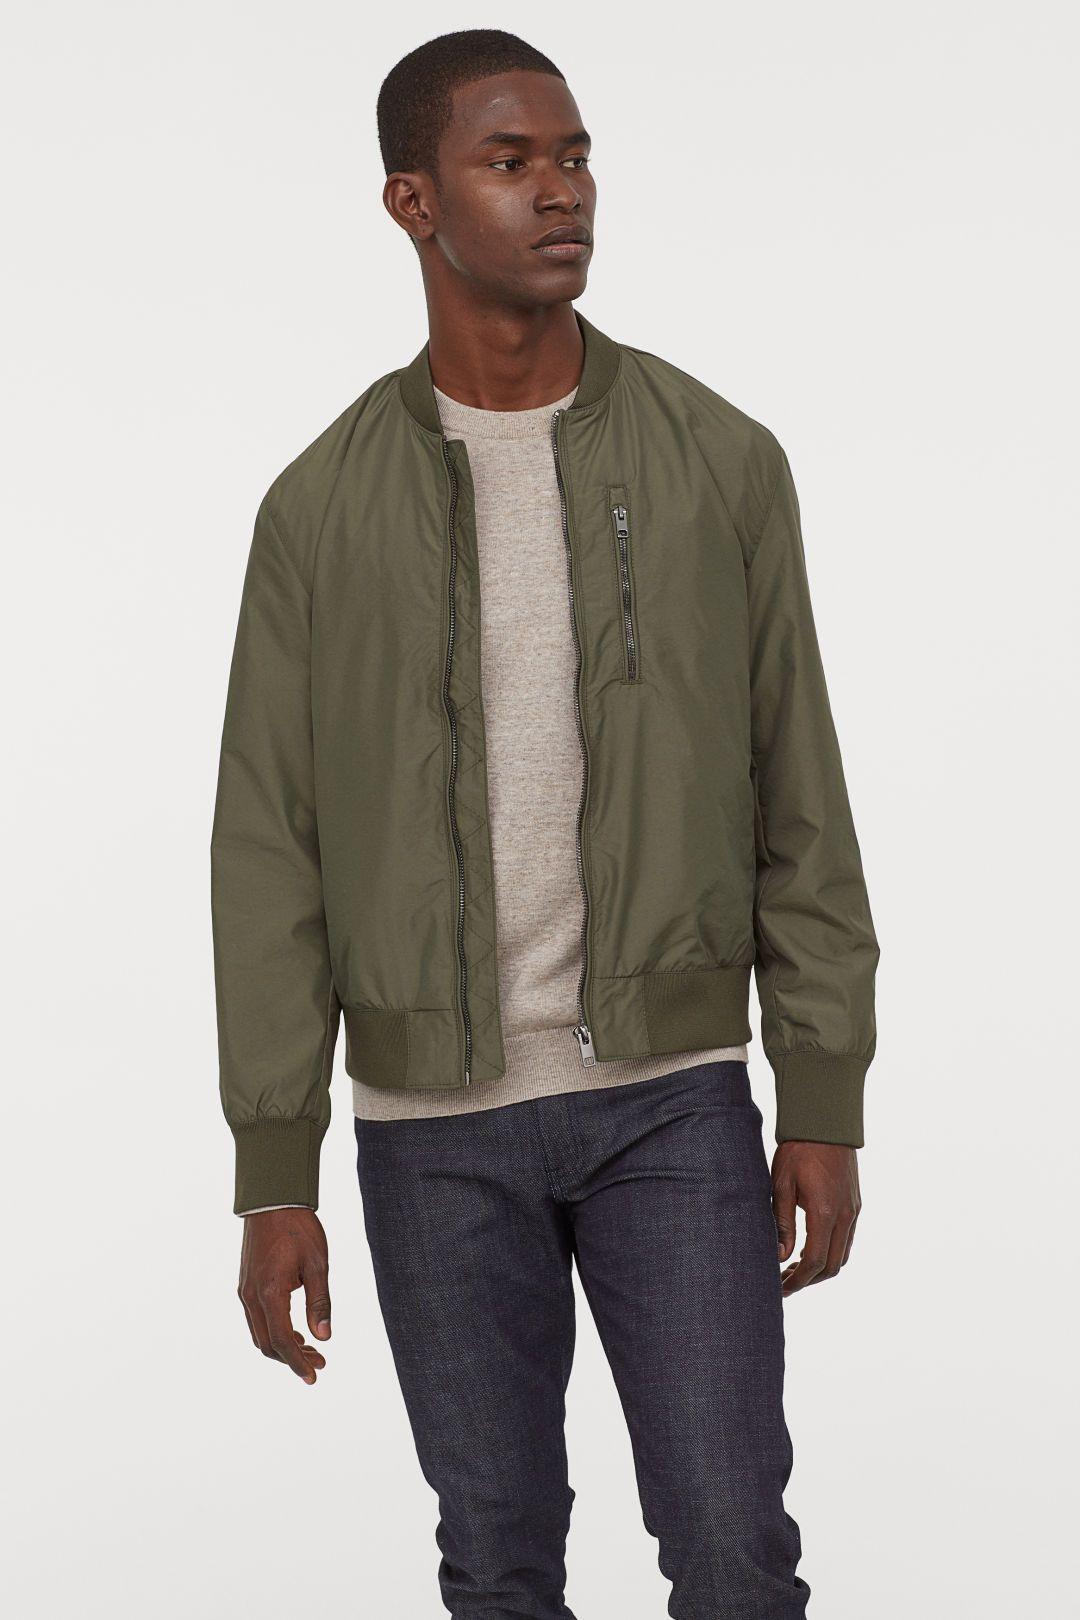 Bomber Jacket Khaki Green Men H M Us Bomber Jacket Vintage Outfits Green Bomber Jacket [ 1620 x 1080 Pixel ]